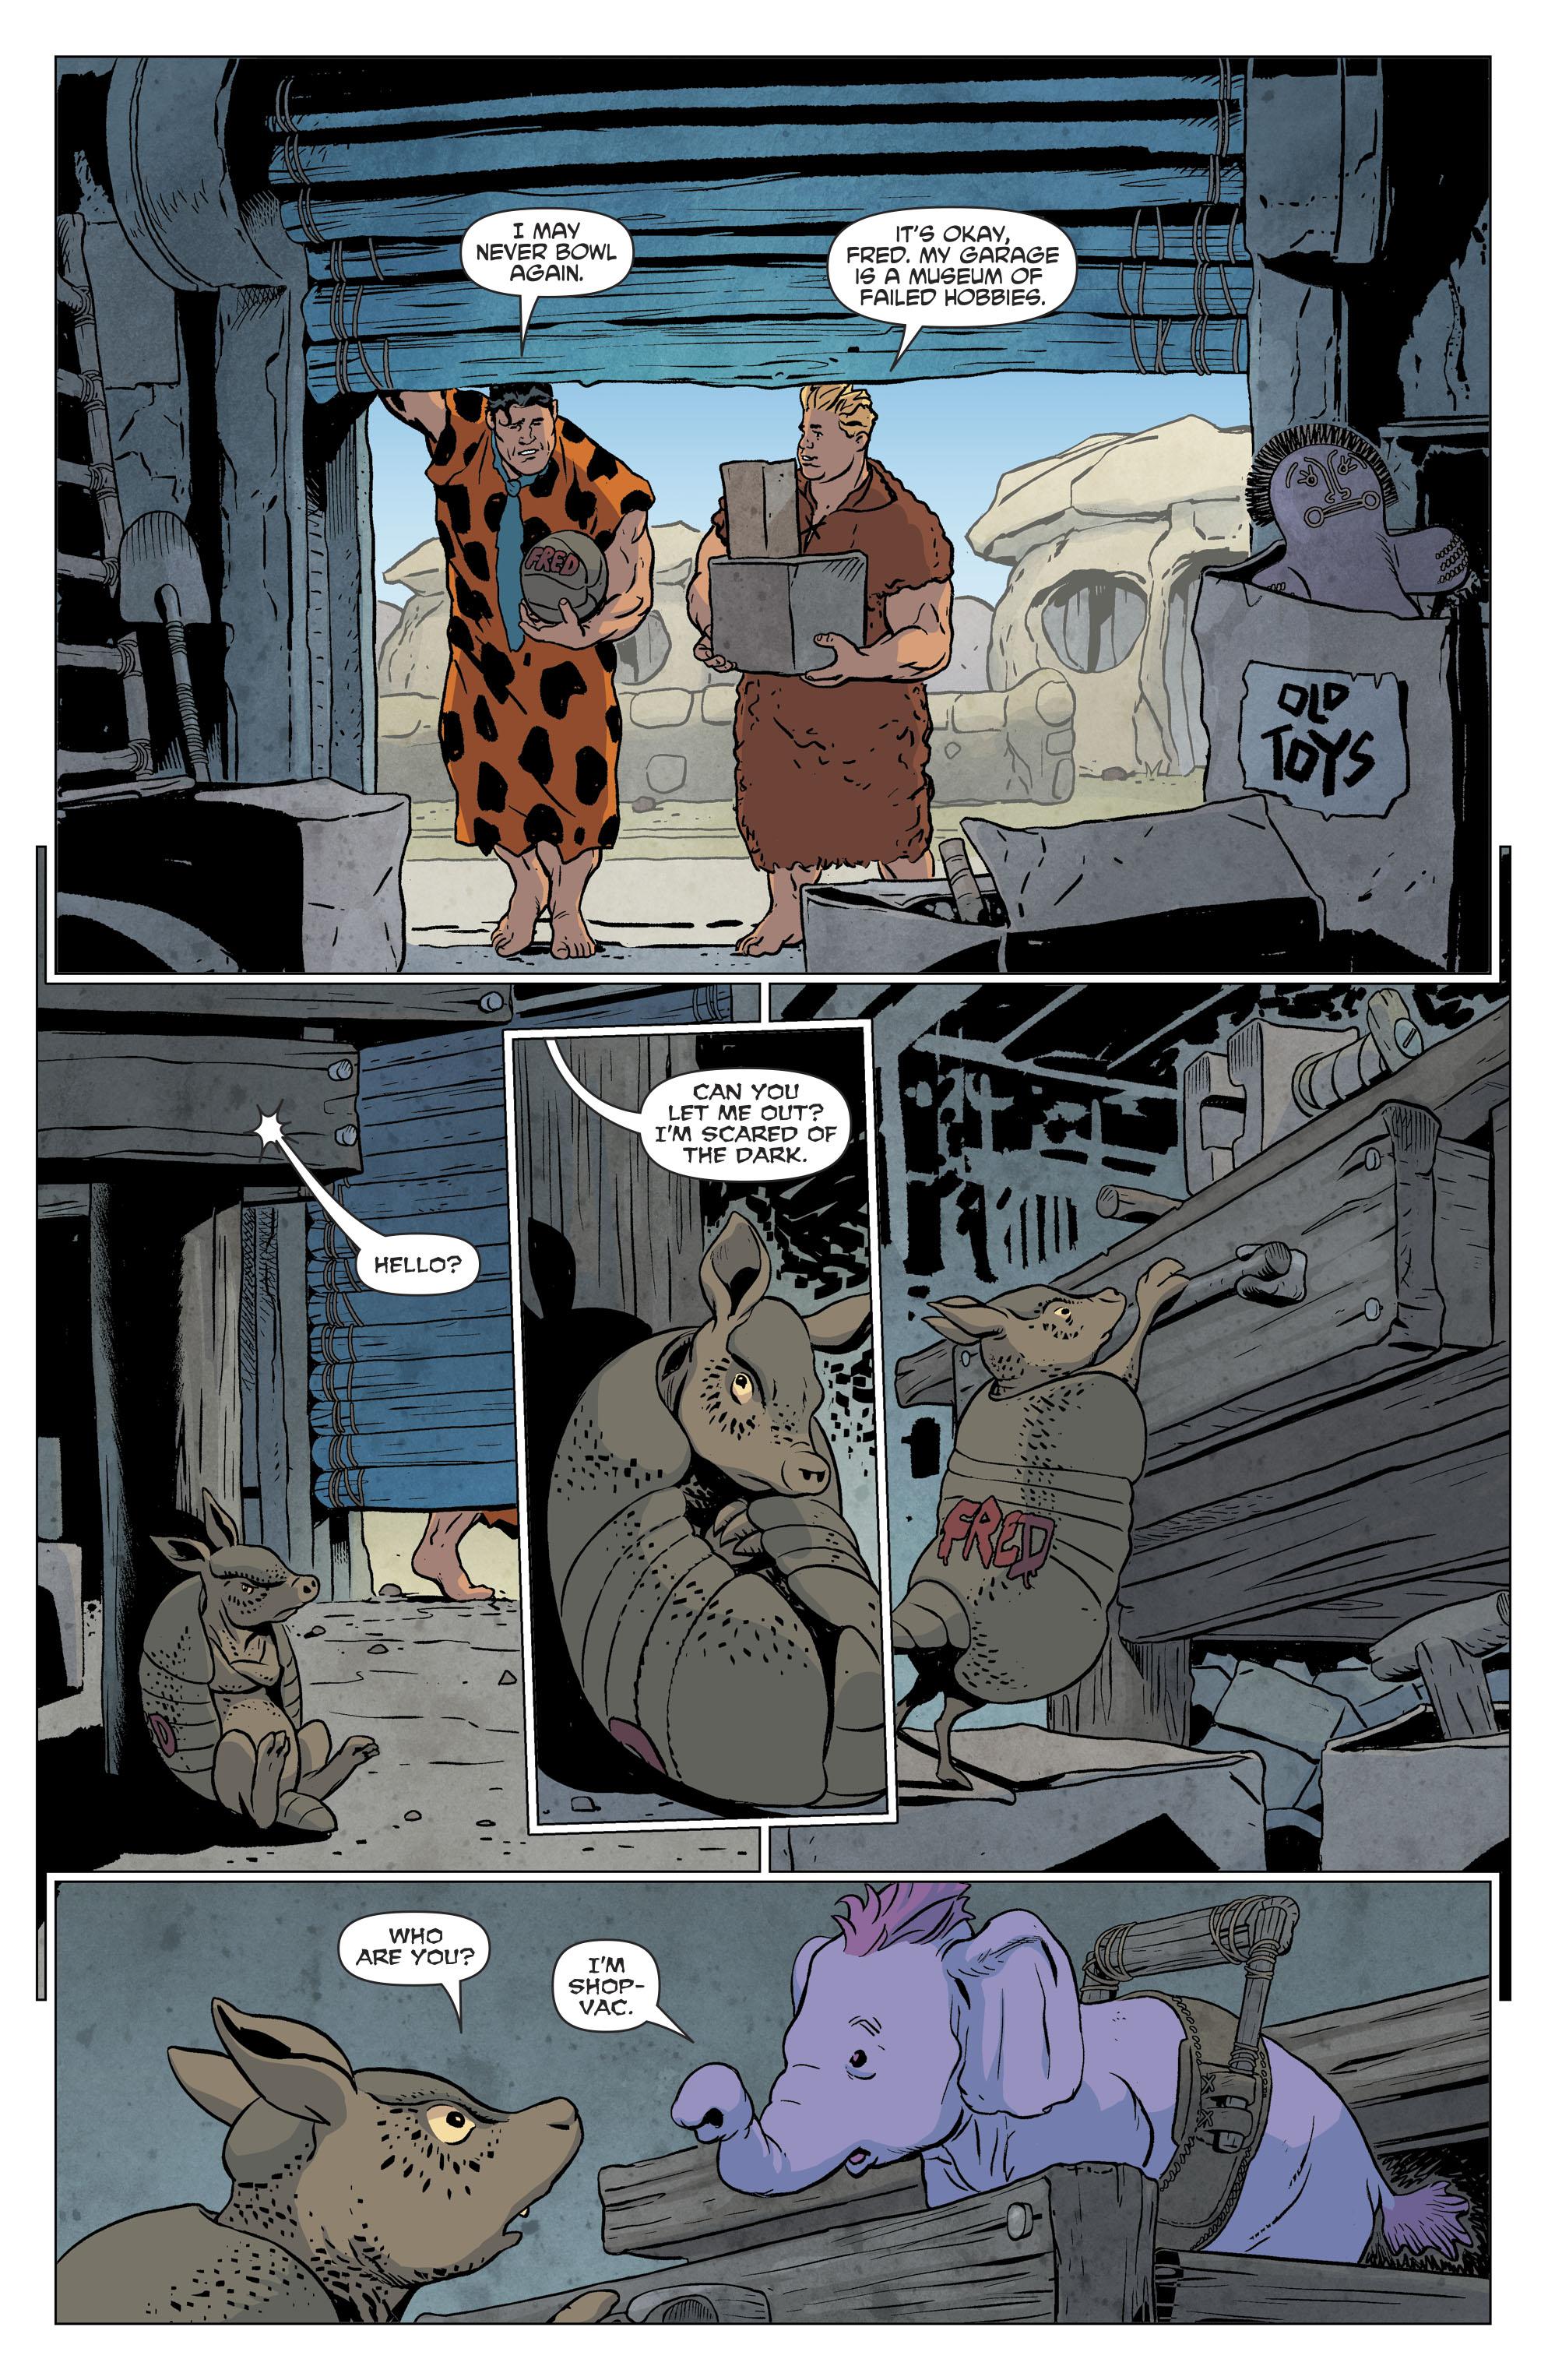 Read online The Flintstones comic -  Issue #12 - 18